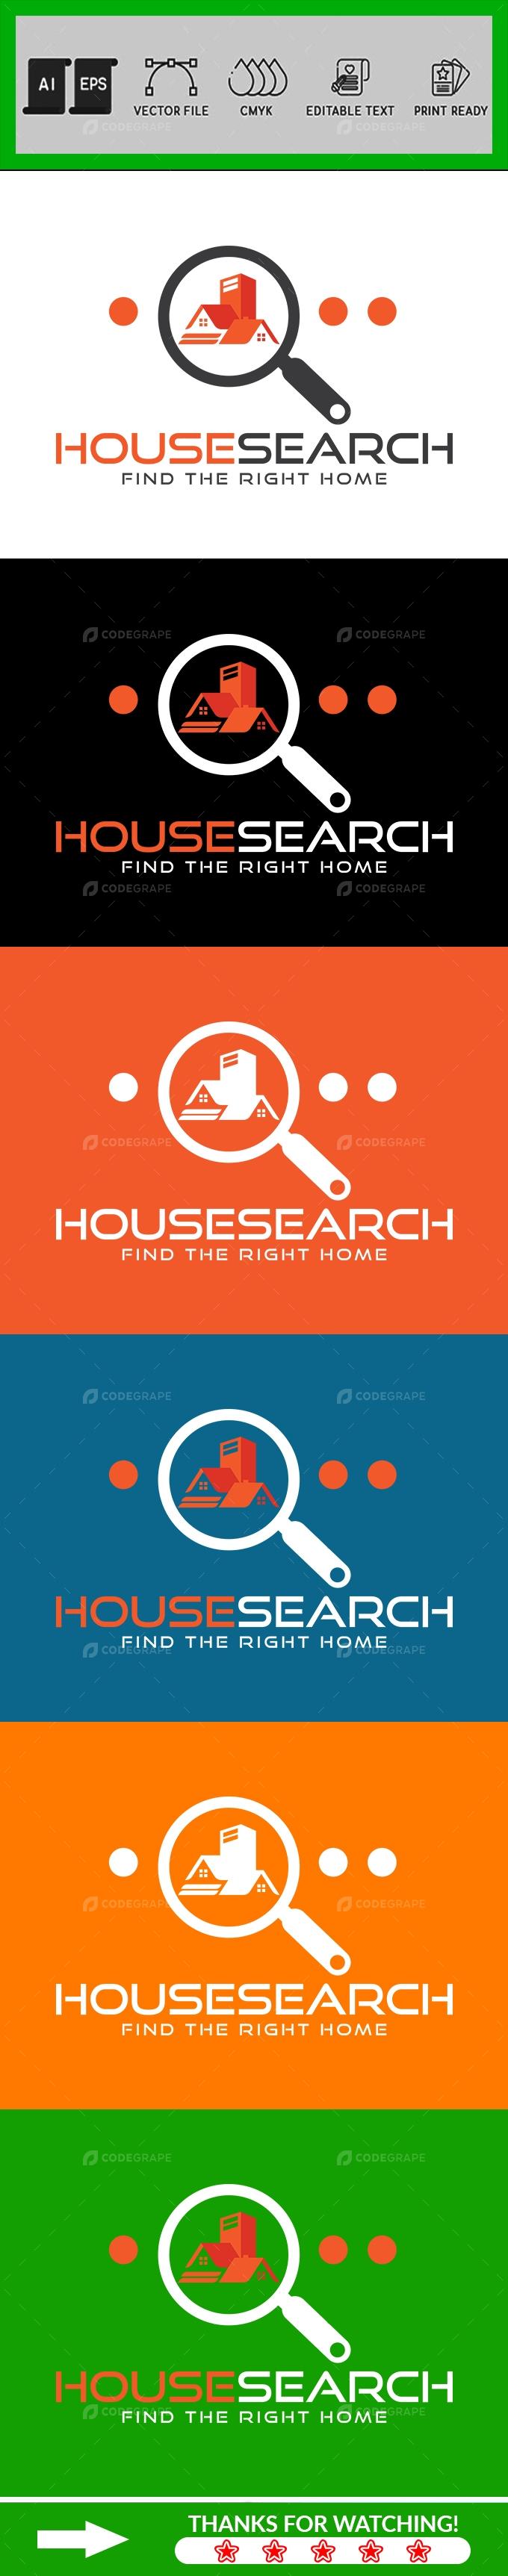 House Search Logo Design Template